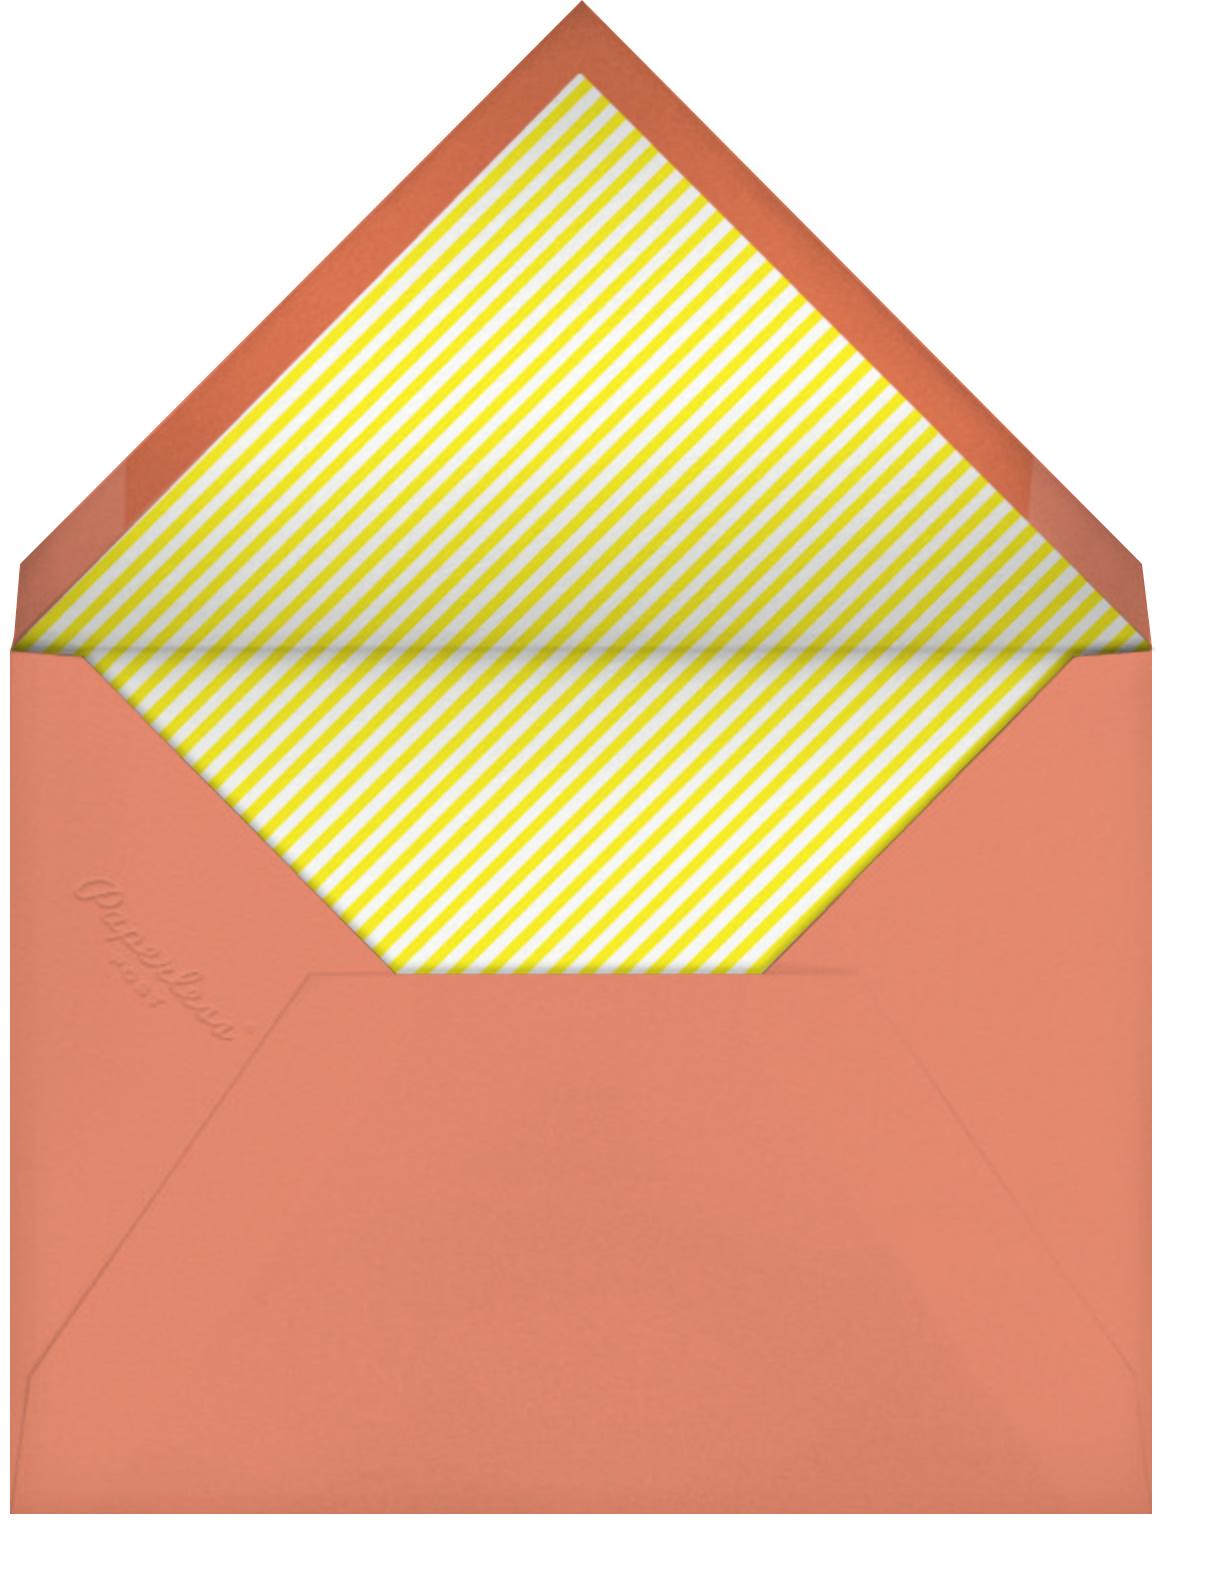 Party Cars - Paperless Post - Summer entertaining - envelope back